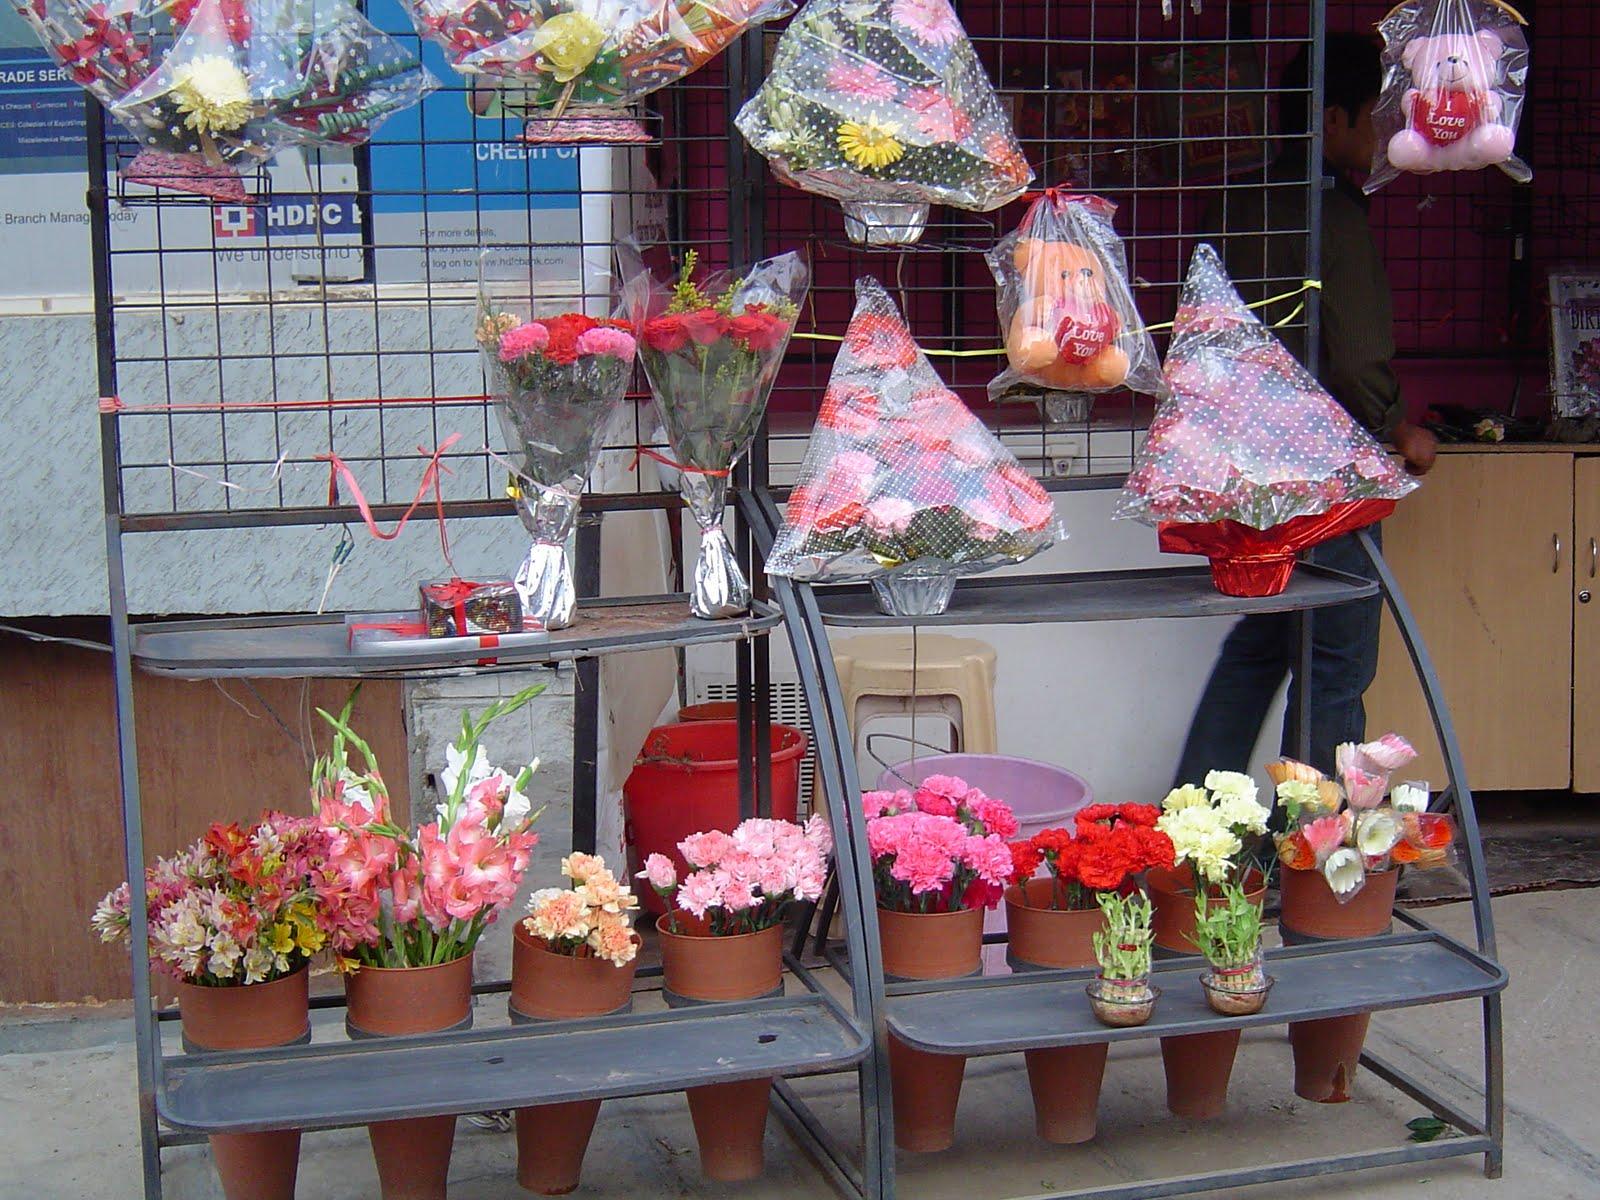 Bangalore Knick Knacks: Bangalore -flower power